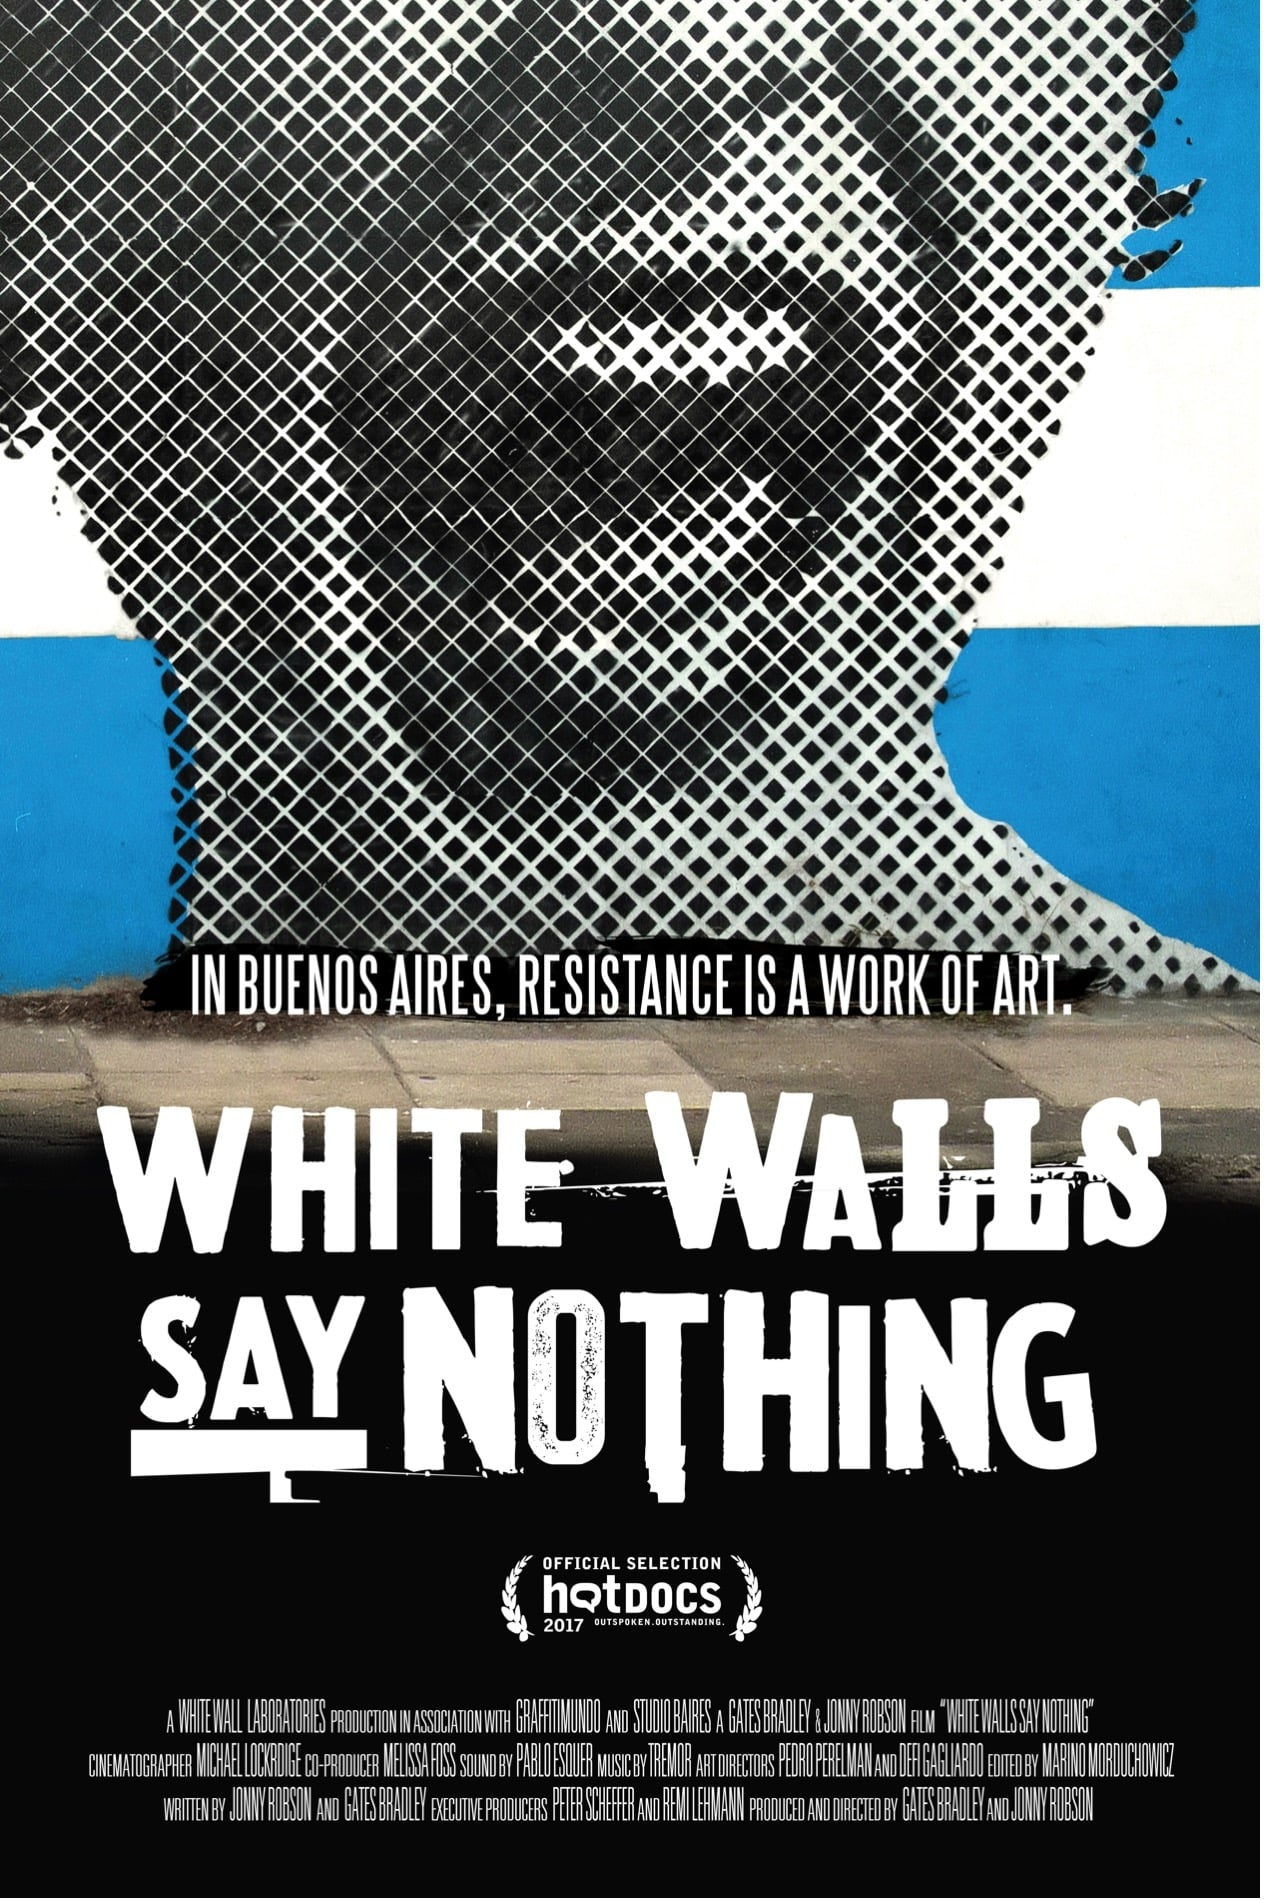 White Walls Say Nothing